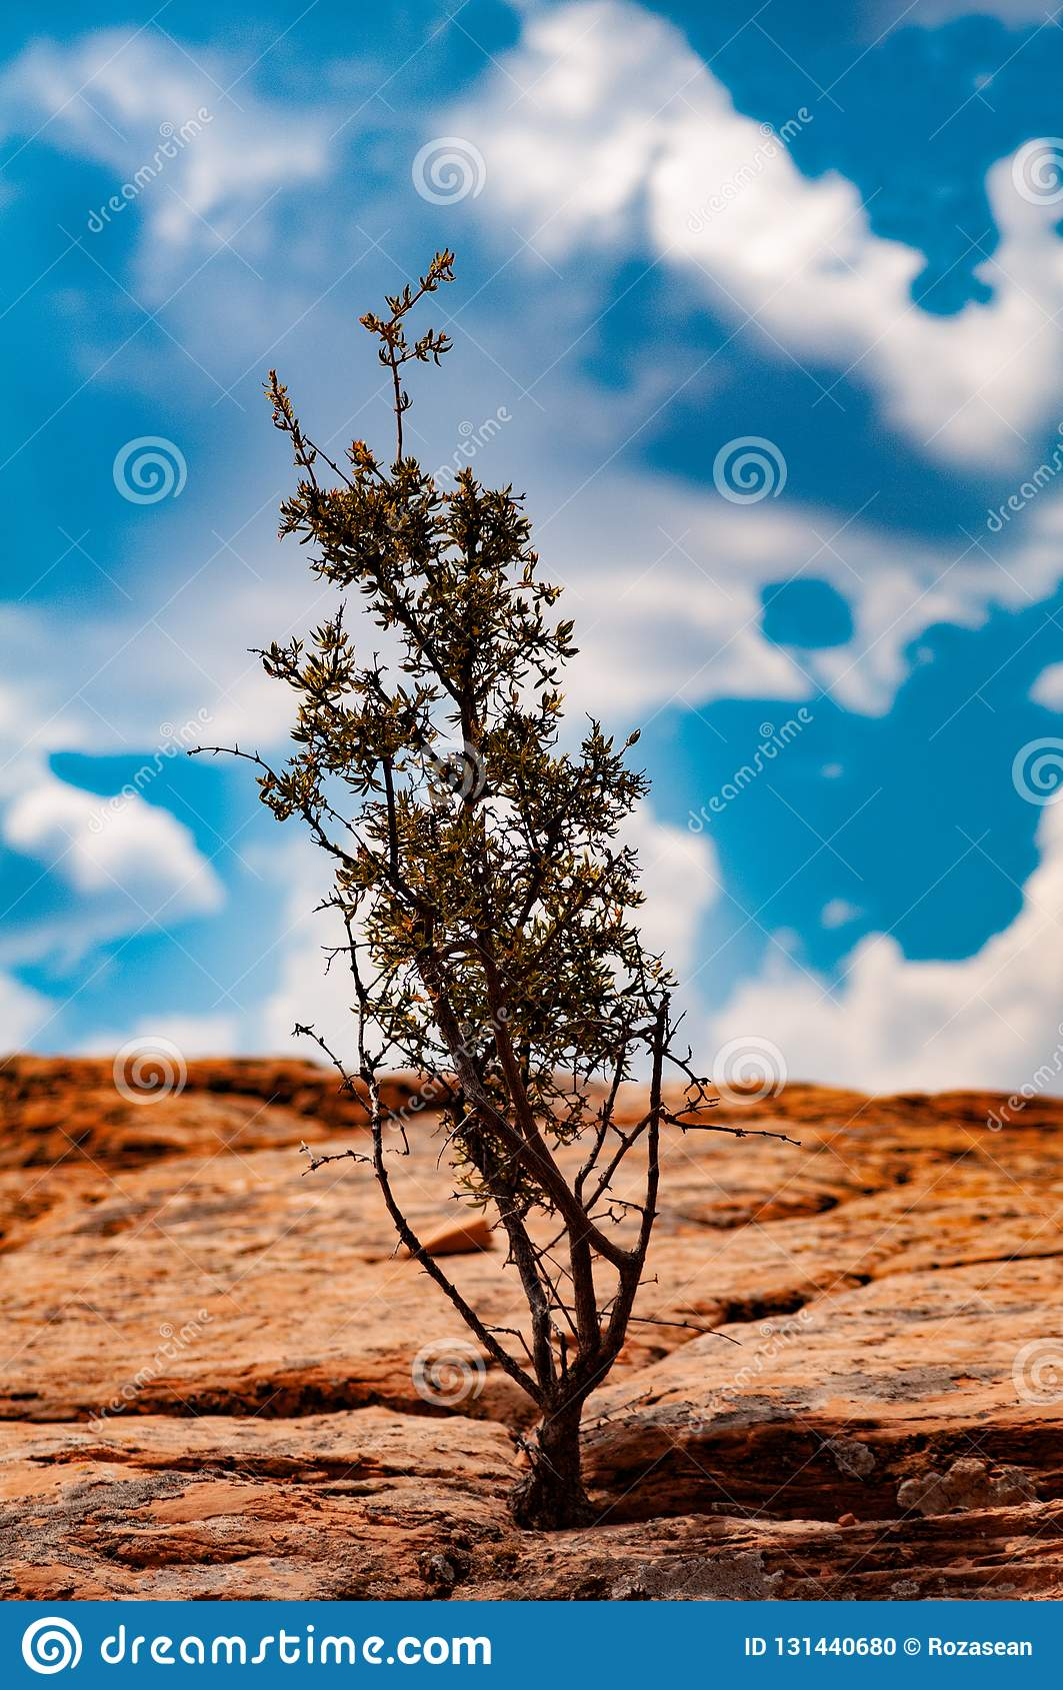 Vegetation, Trees In The Colorado Plateau In Tuba City